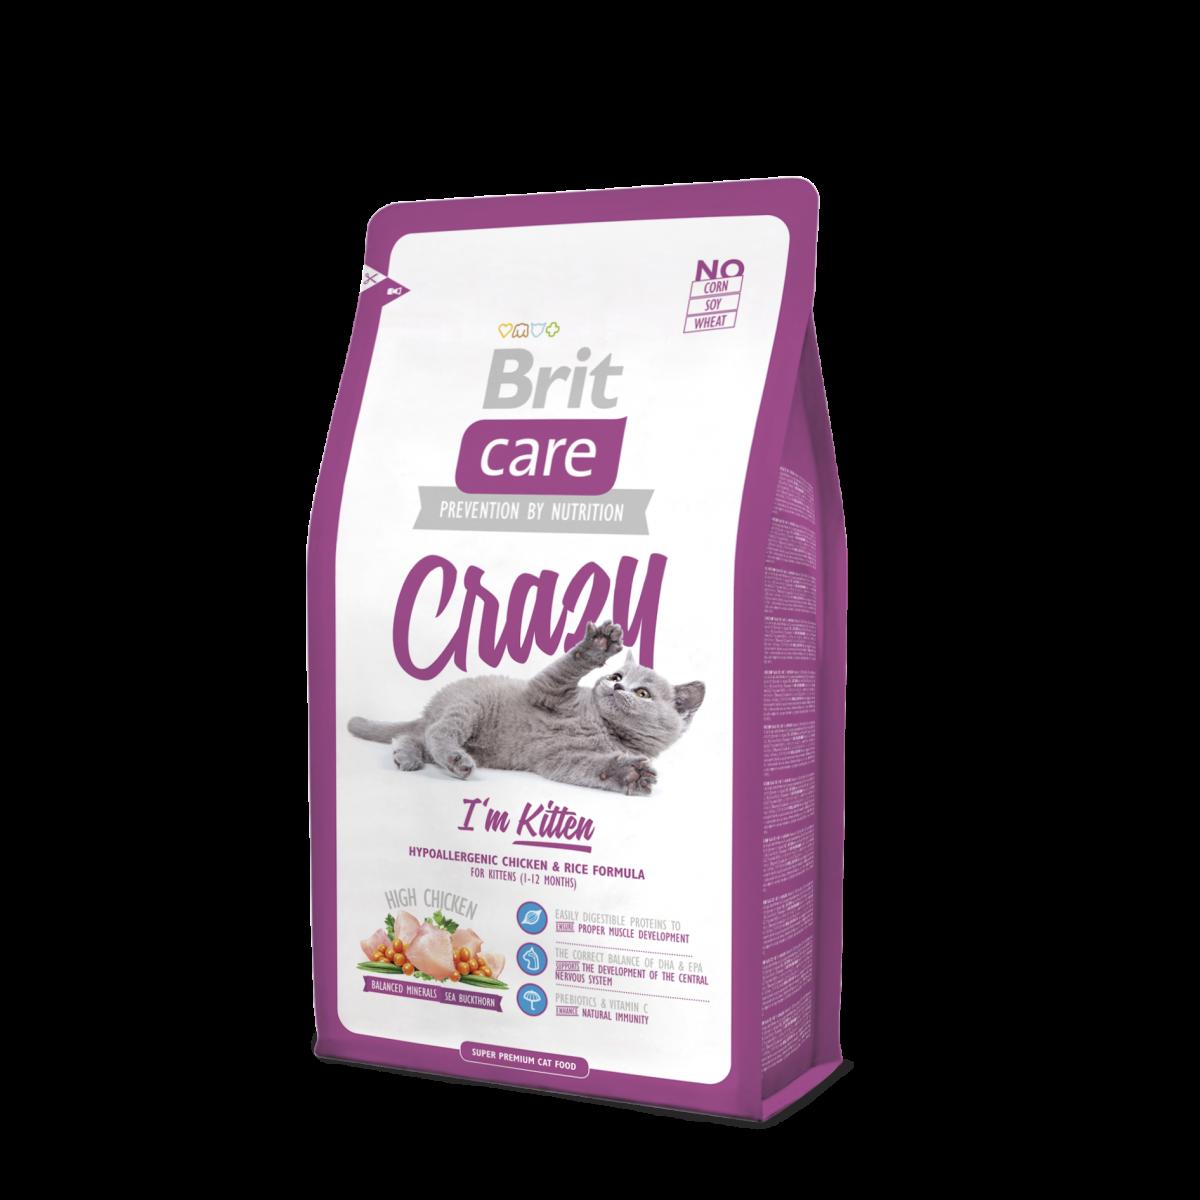 Корм для котят Brit Care Cat Crazy I'm Kitten 7 кг